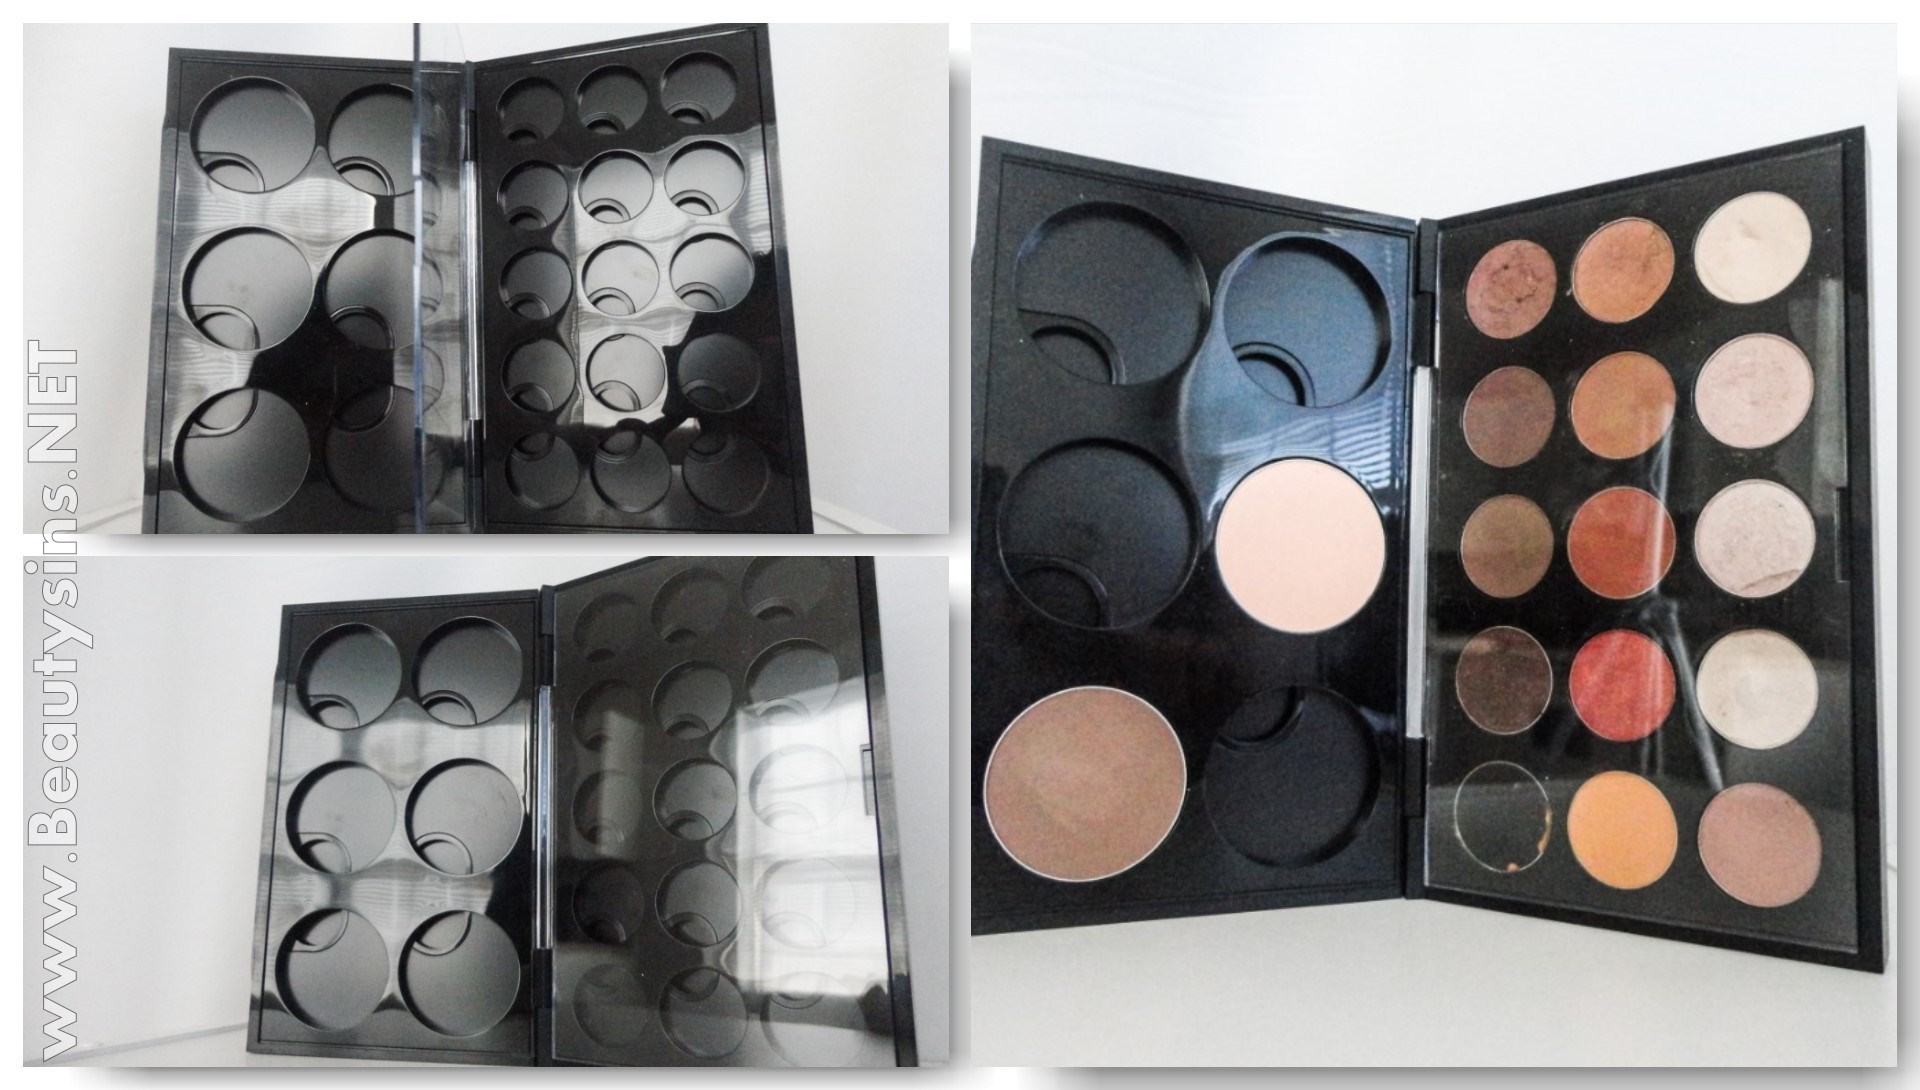 Mac Cosmetics Palettes Blush Palette Eyeshadow Pro